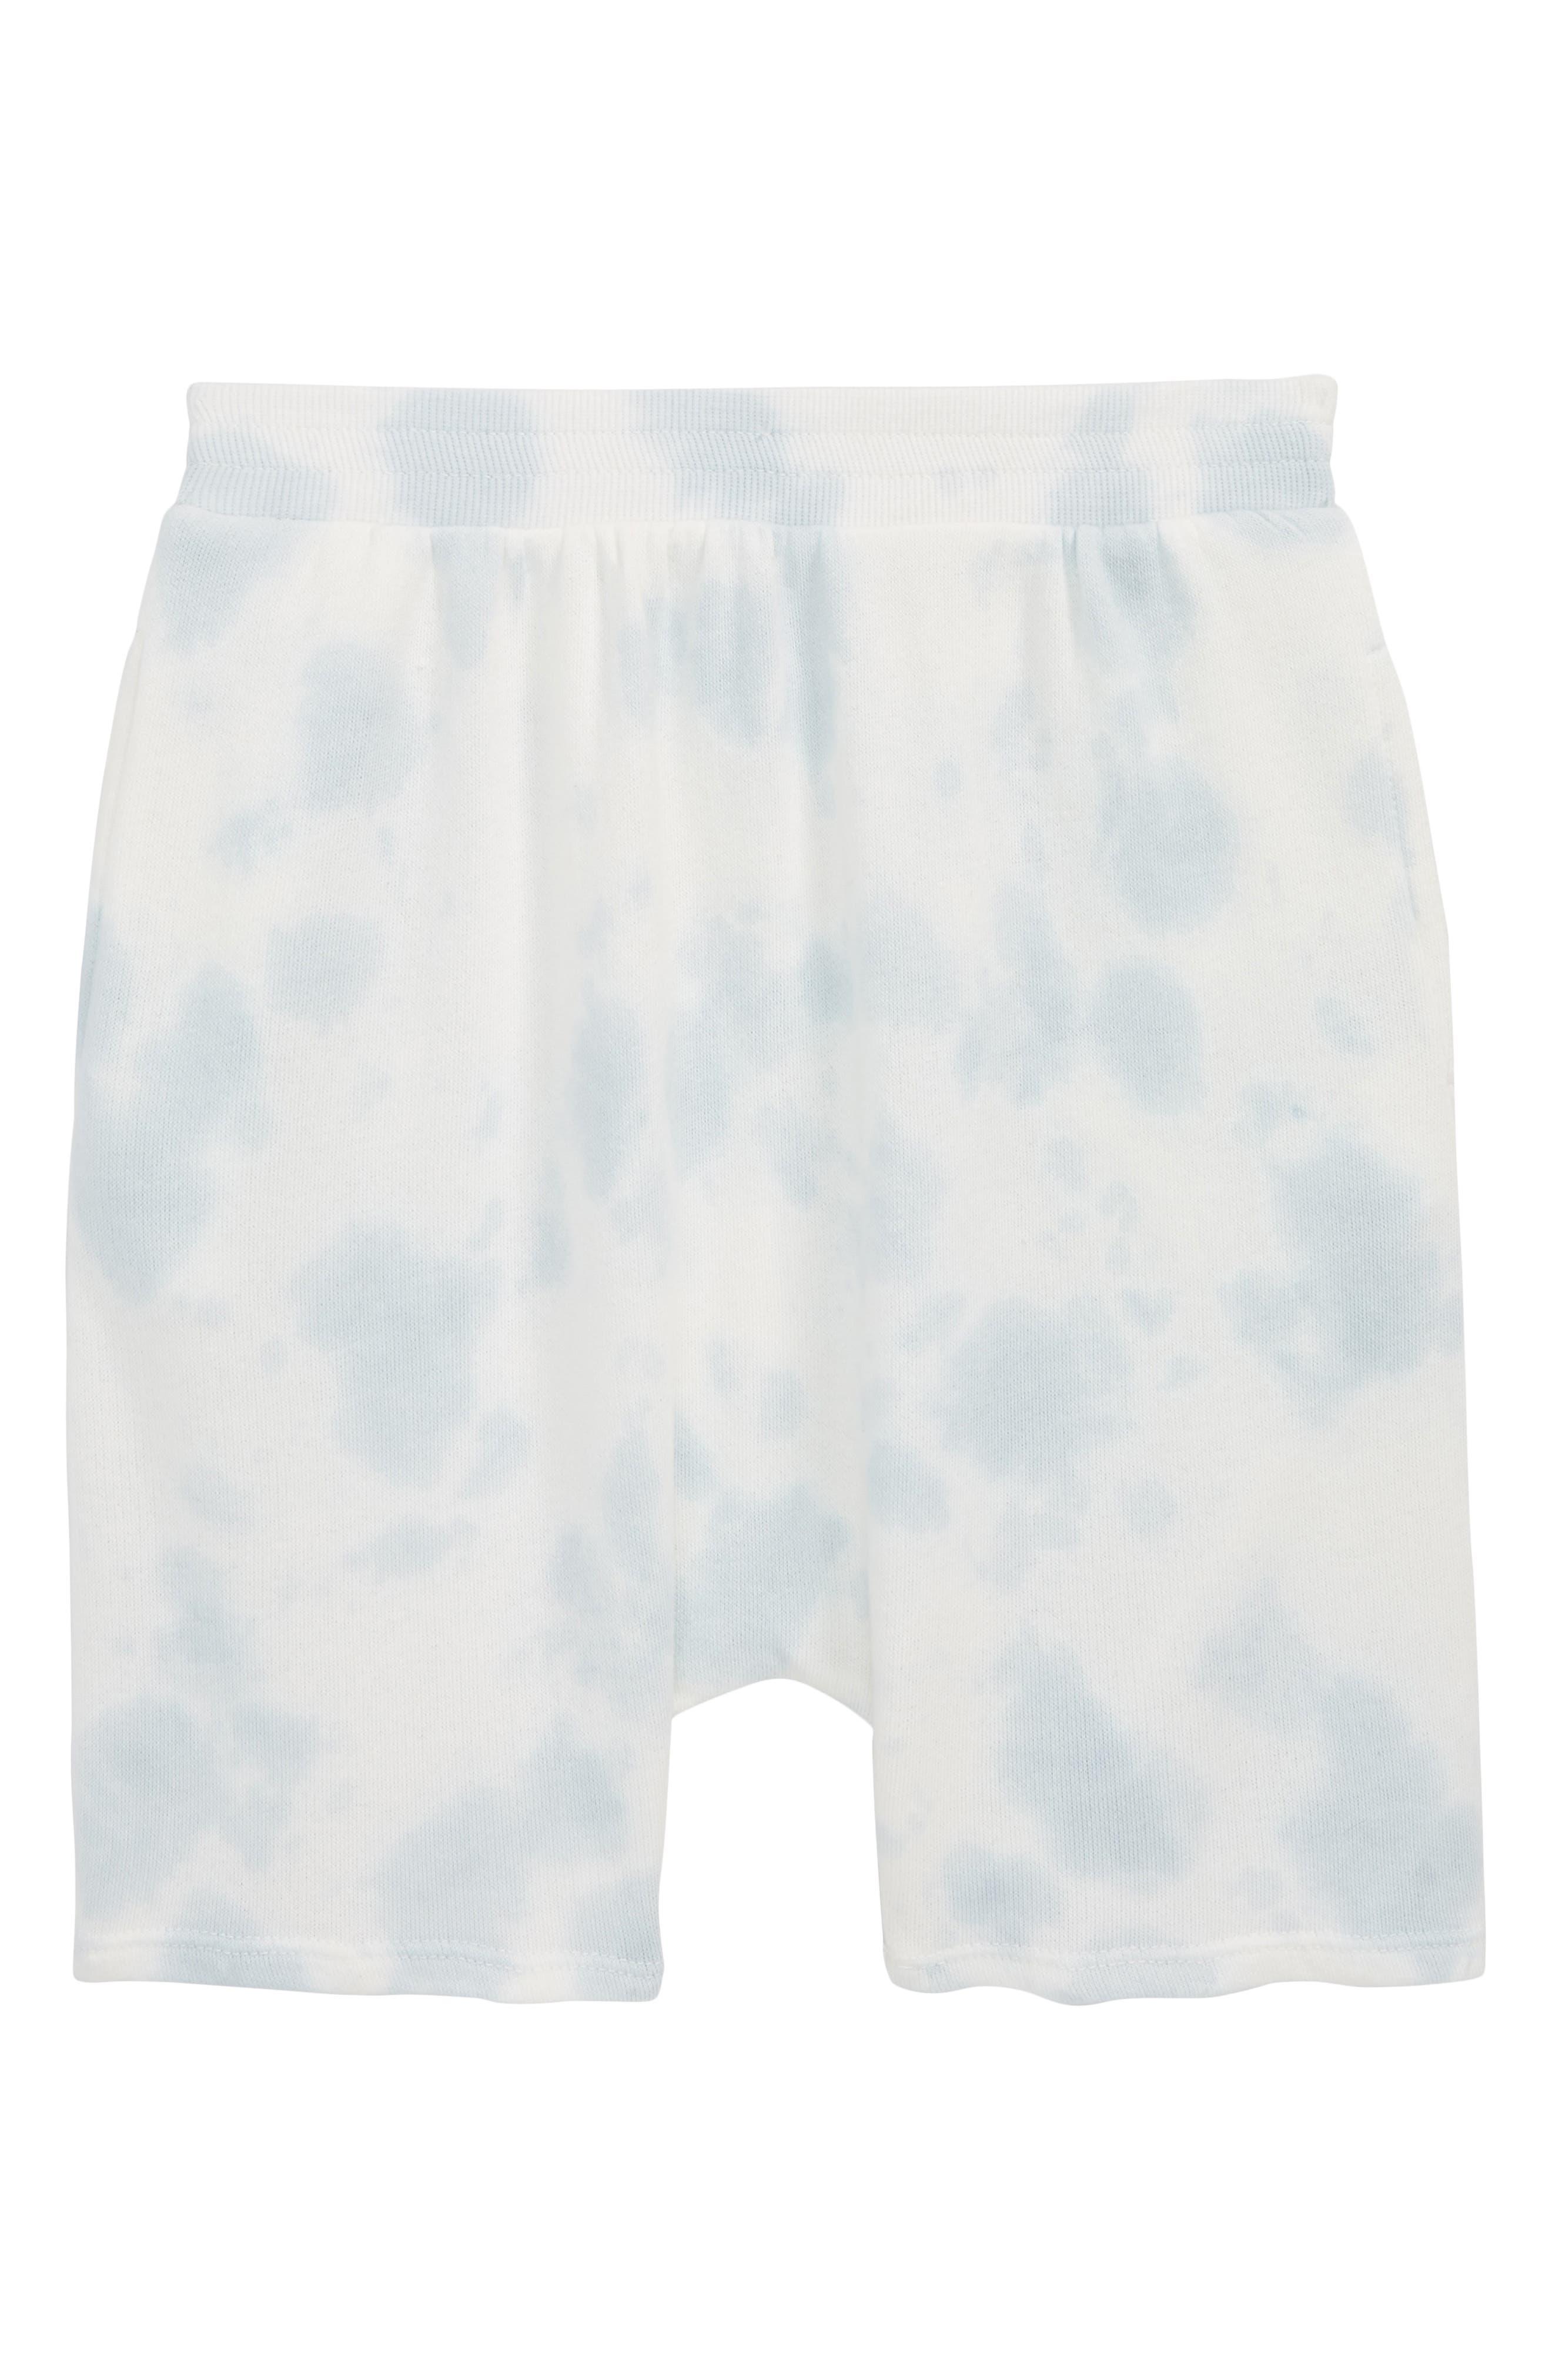 Tie Dye Shorts,                             Main thumbnail 1, color,                             450